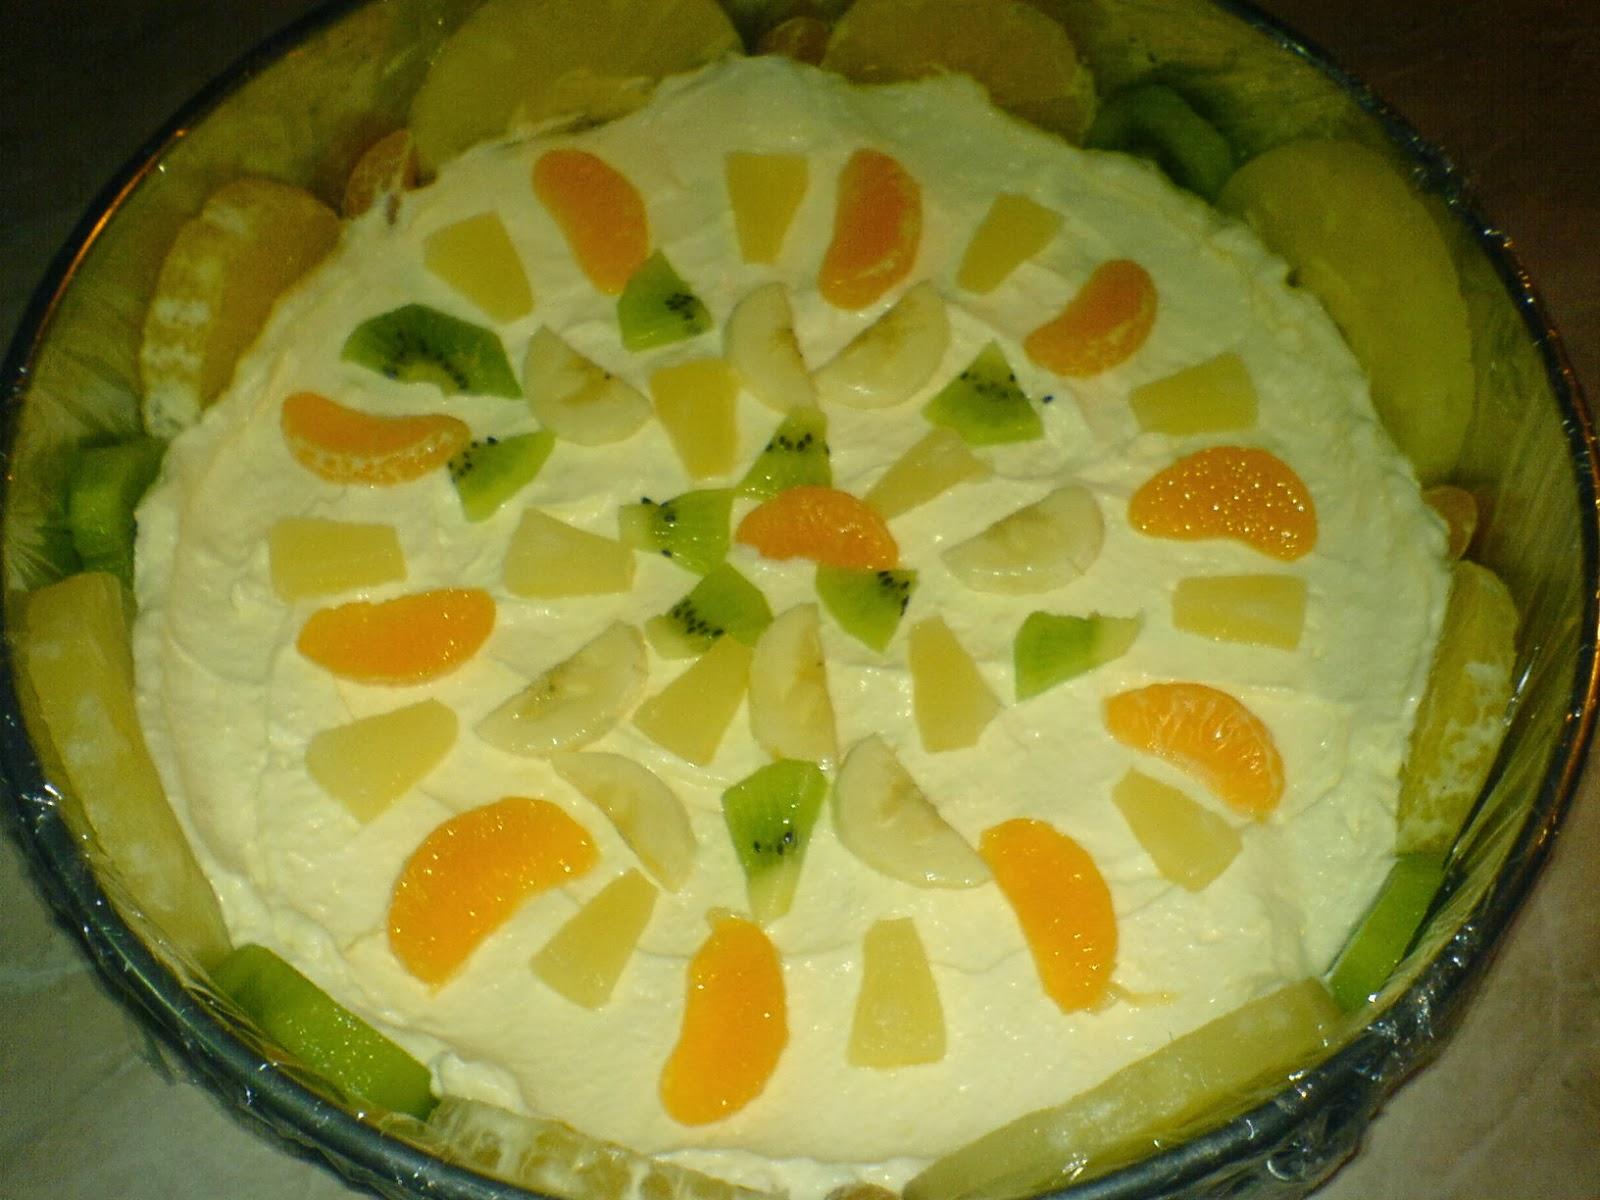 preparare tort diplomat, preparare tort diplomat cu fructe, cum se prepara tortul diplomat cu fructe, cum se face tortul diplomat, cum facem tort diplomat,